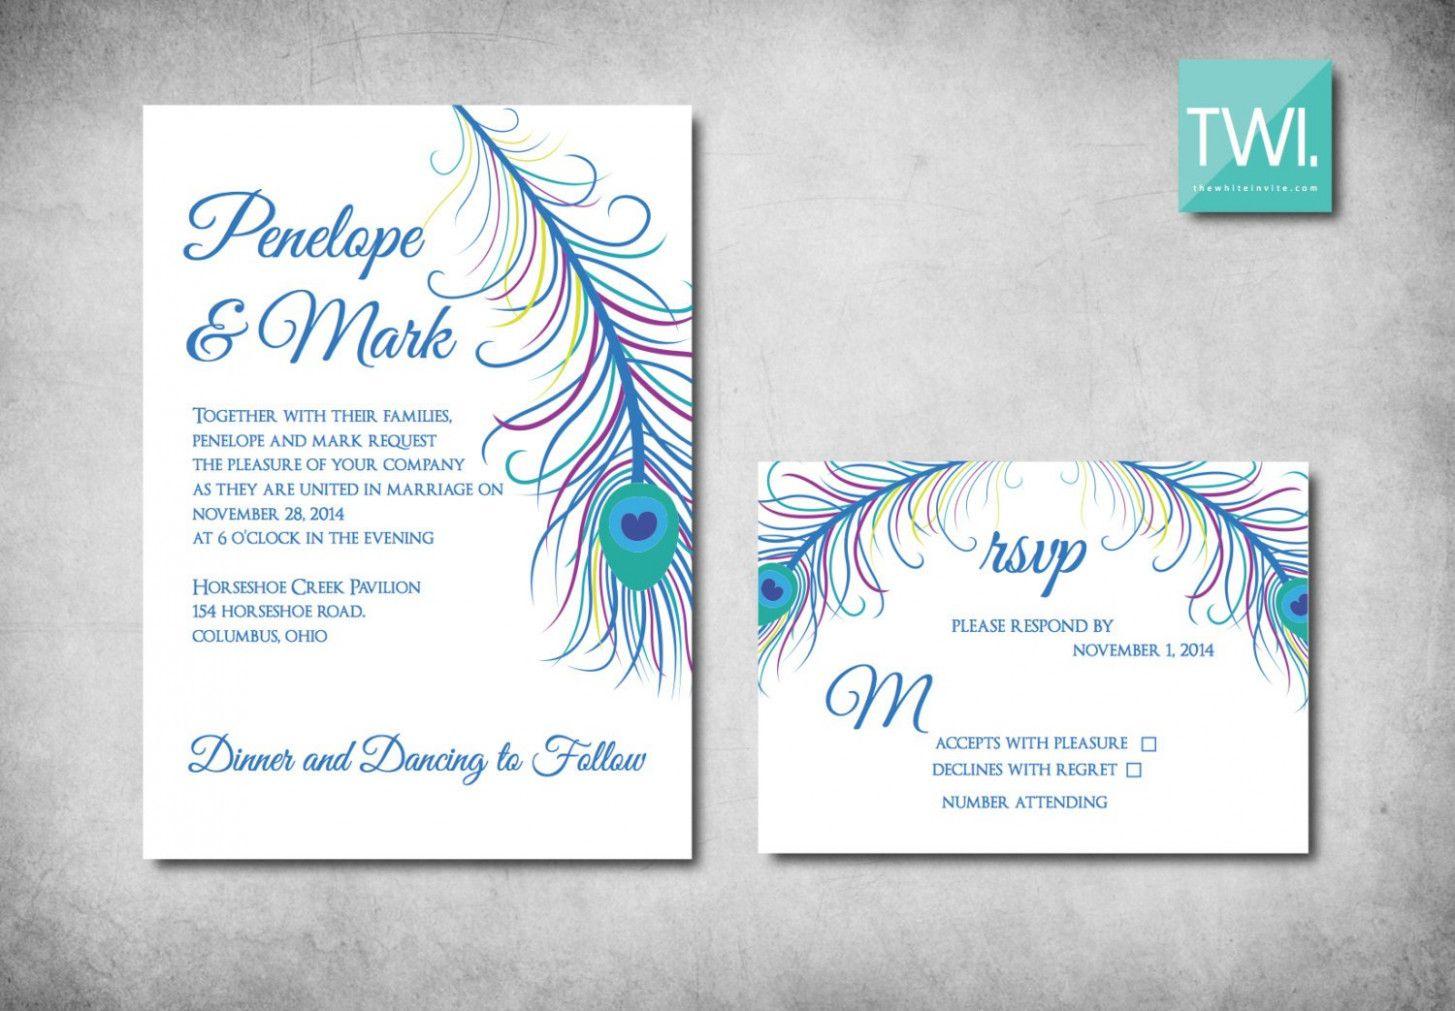 Wedding Invitations Rsvp Save The Date | Cree's wedding ideas